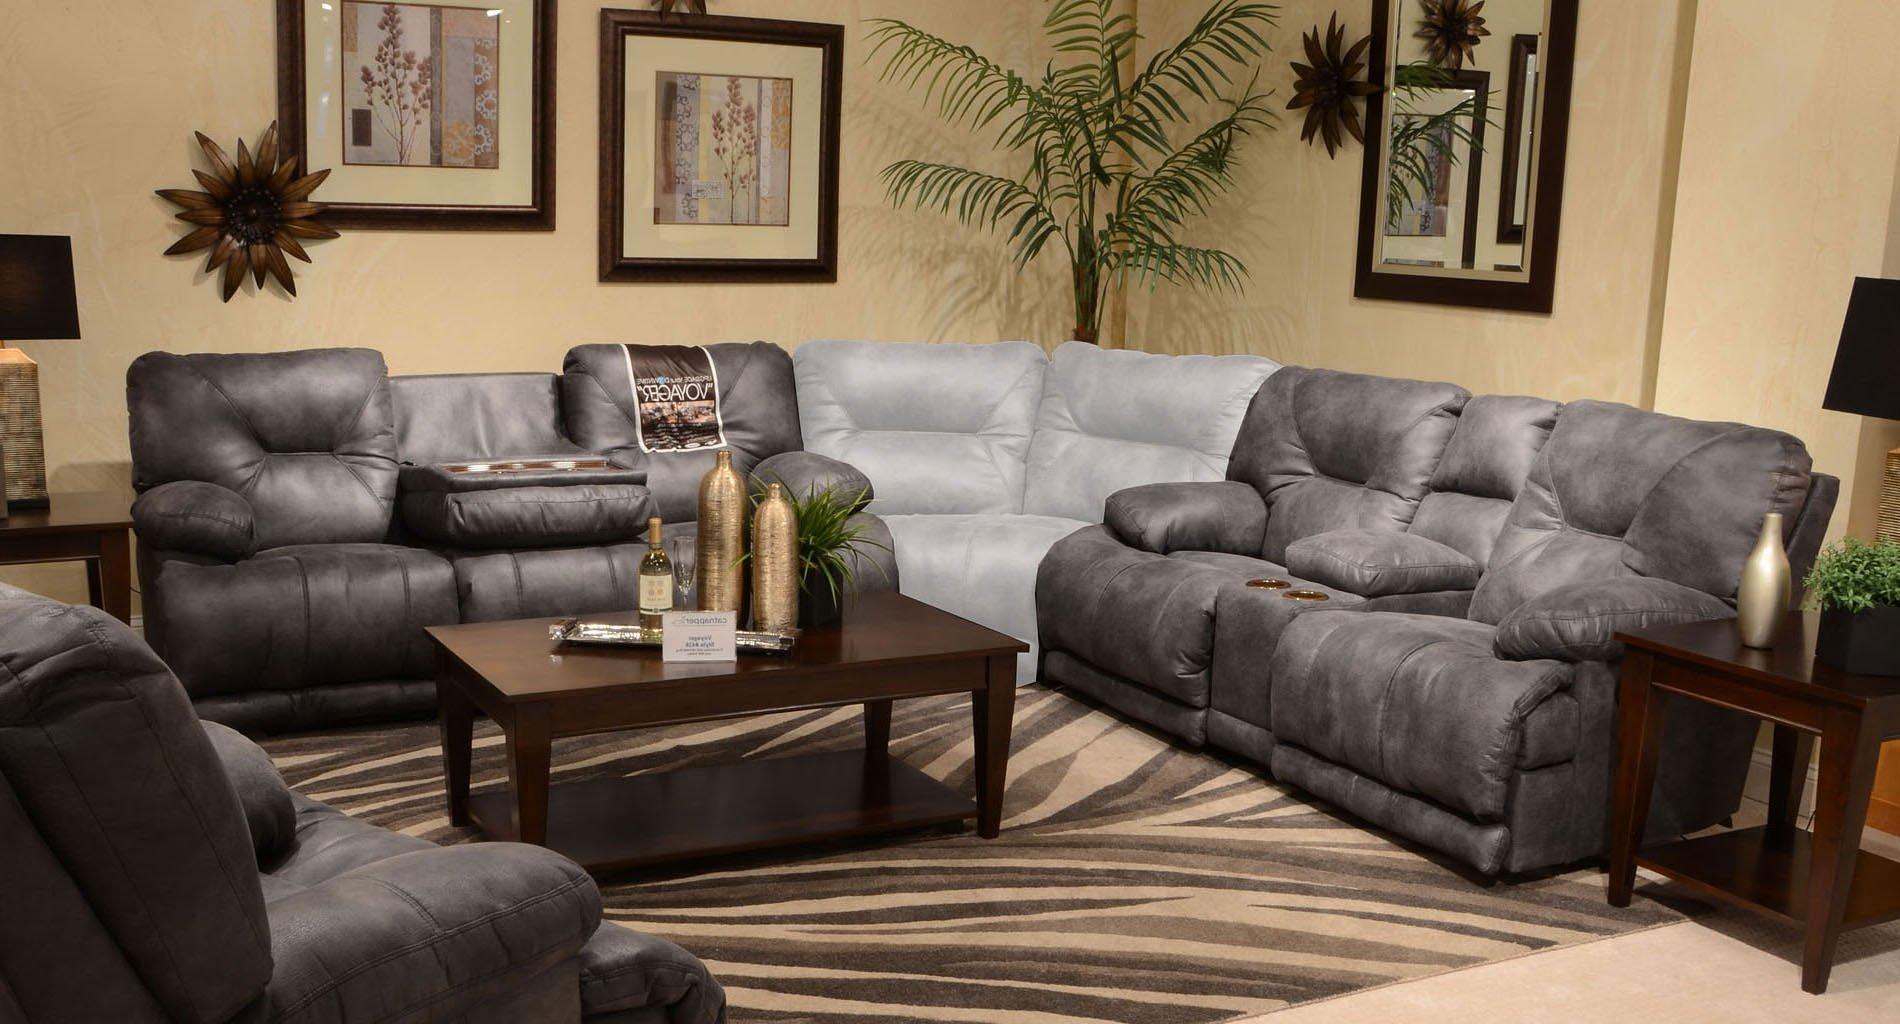 voyager lay flat triple reclining sofa most comfortable sofas australia power living room set slate catnapper